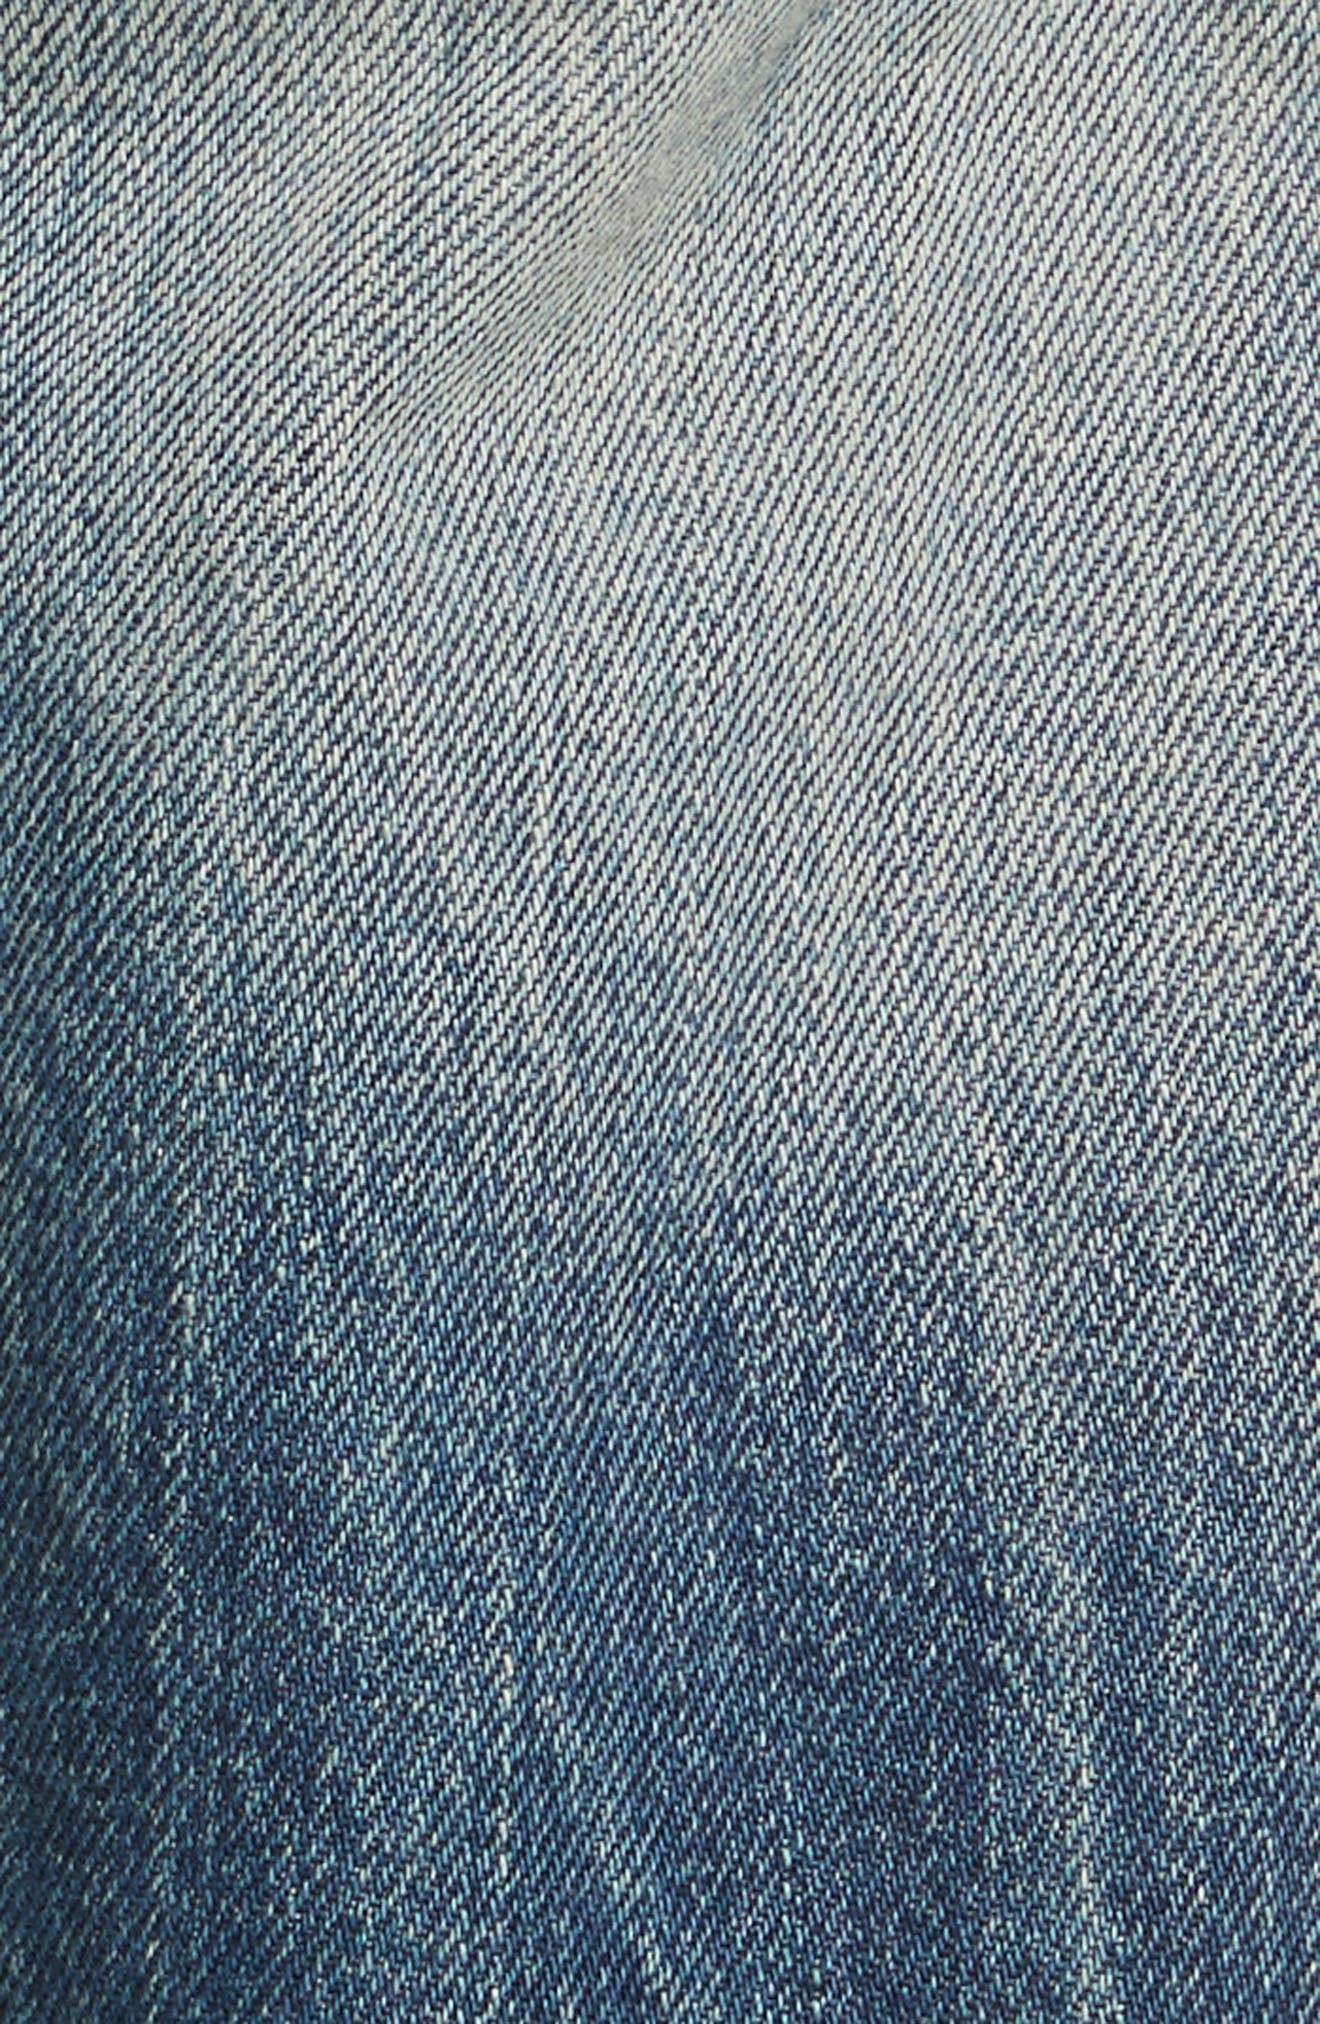 Biker Jeans,                             Alternate thumbnail 5, color,                             Denim Blue